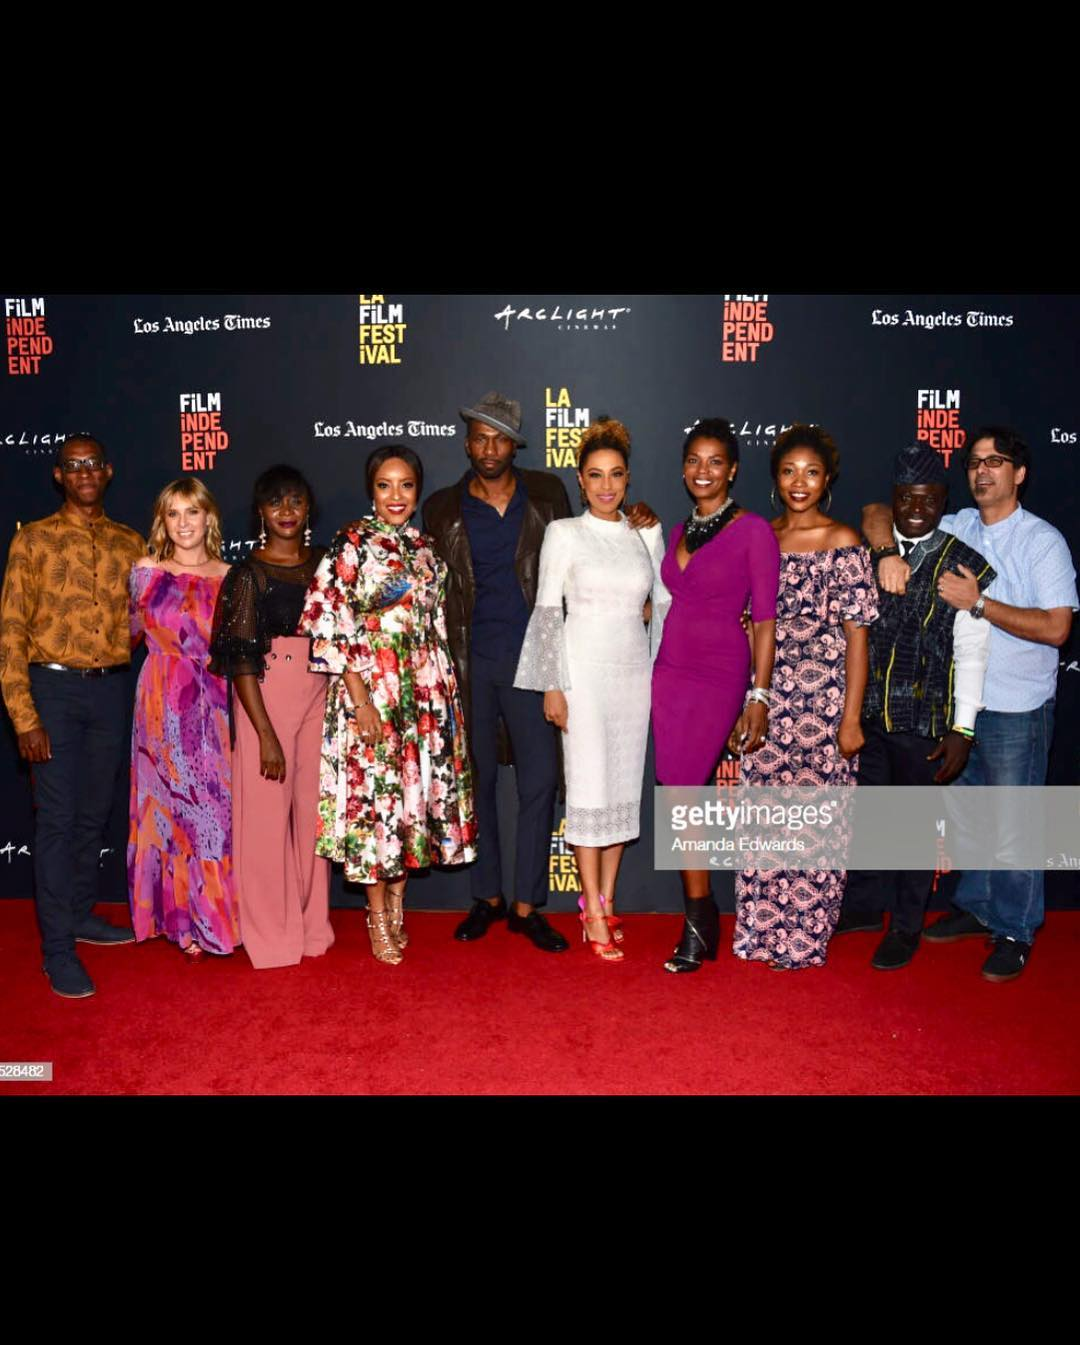 Los Angeles: Joselyn Dumas, Nikki Samonas Attend Premiere For '40 & Single'(PHOTOS)